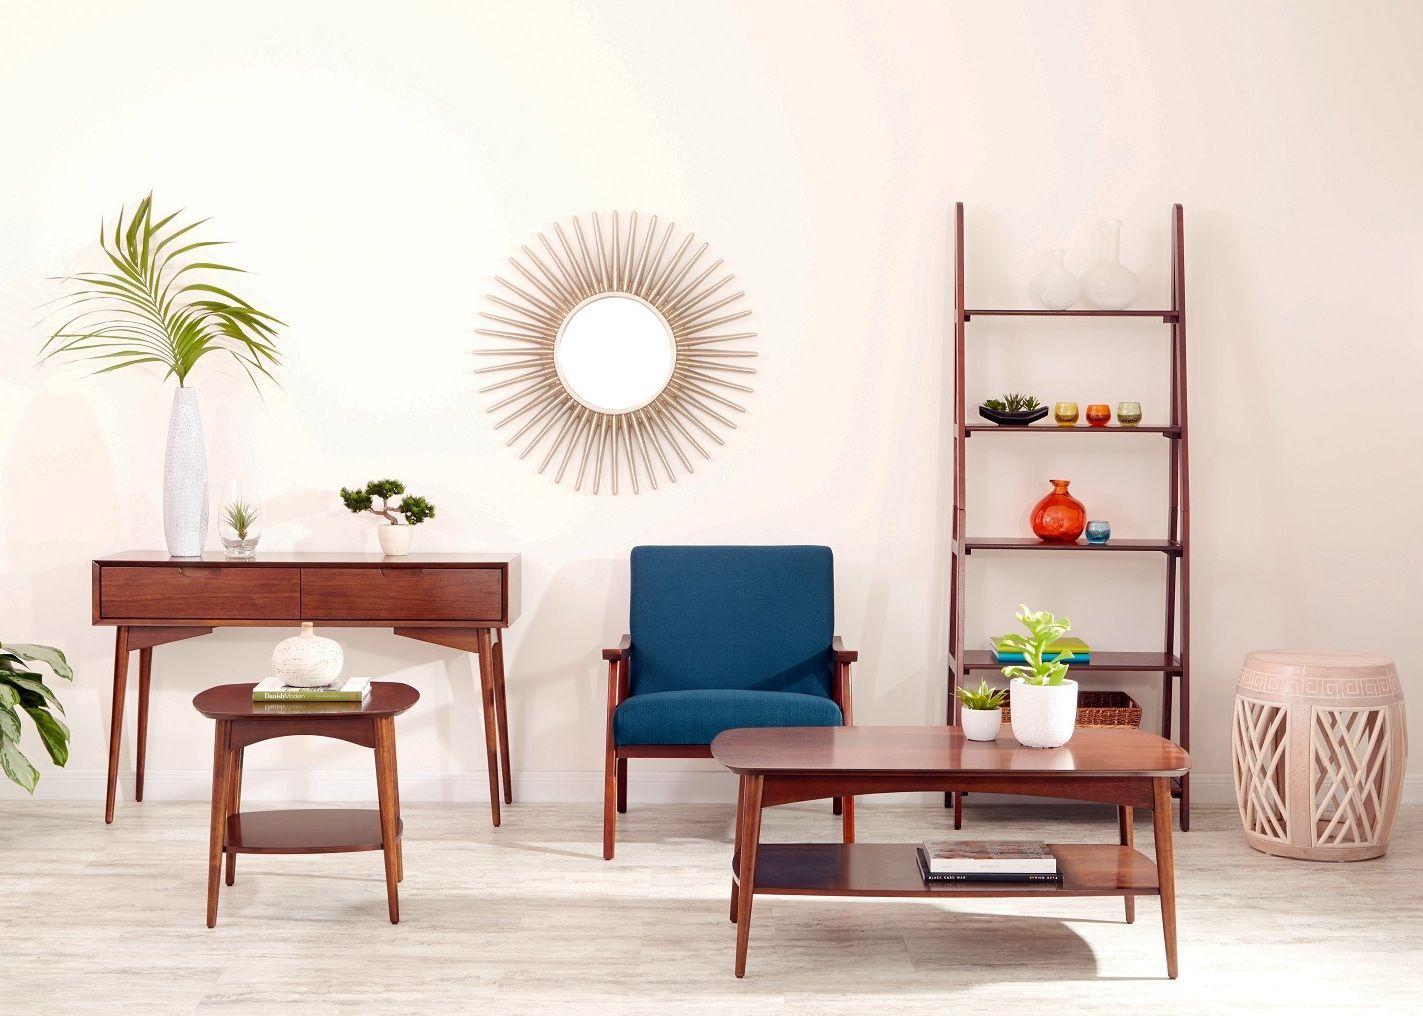 Interior Design Goals: #Midcenturymodern Style Featuring OSP Design  Copenhagen Collection U0026 Ave Six Davis